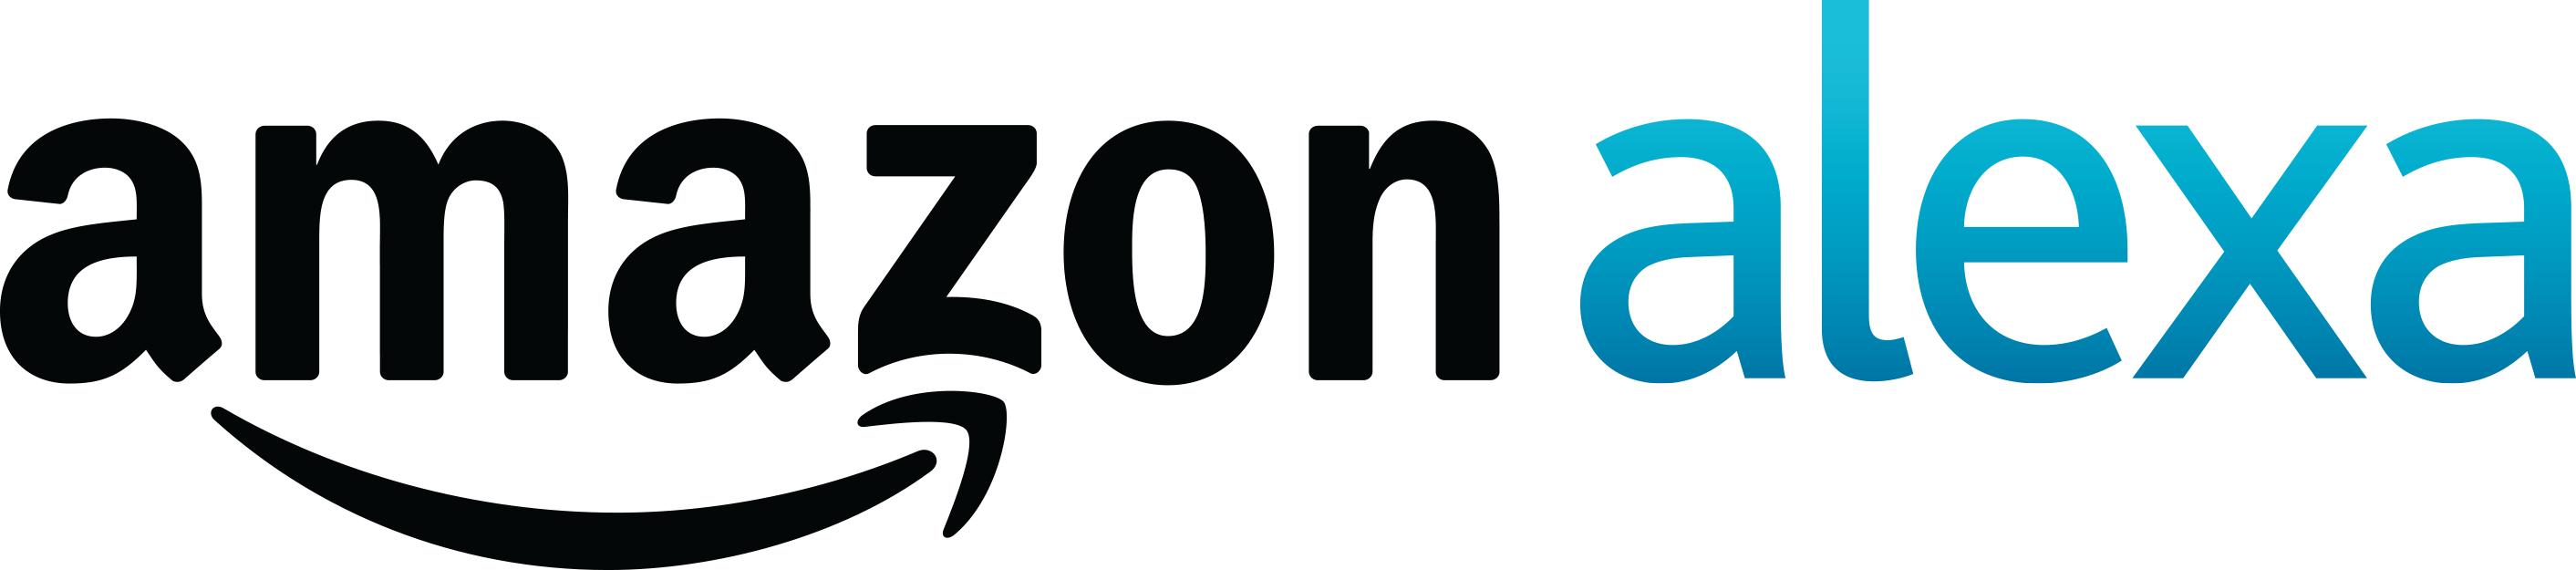 Amazon-Alexa-logo_transparent12.png